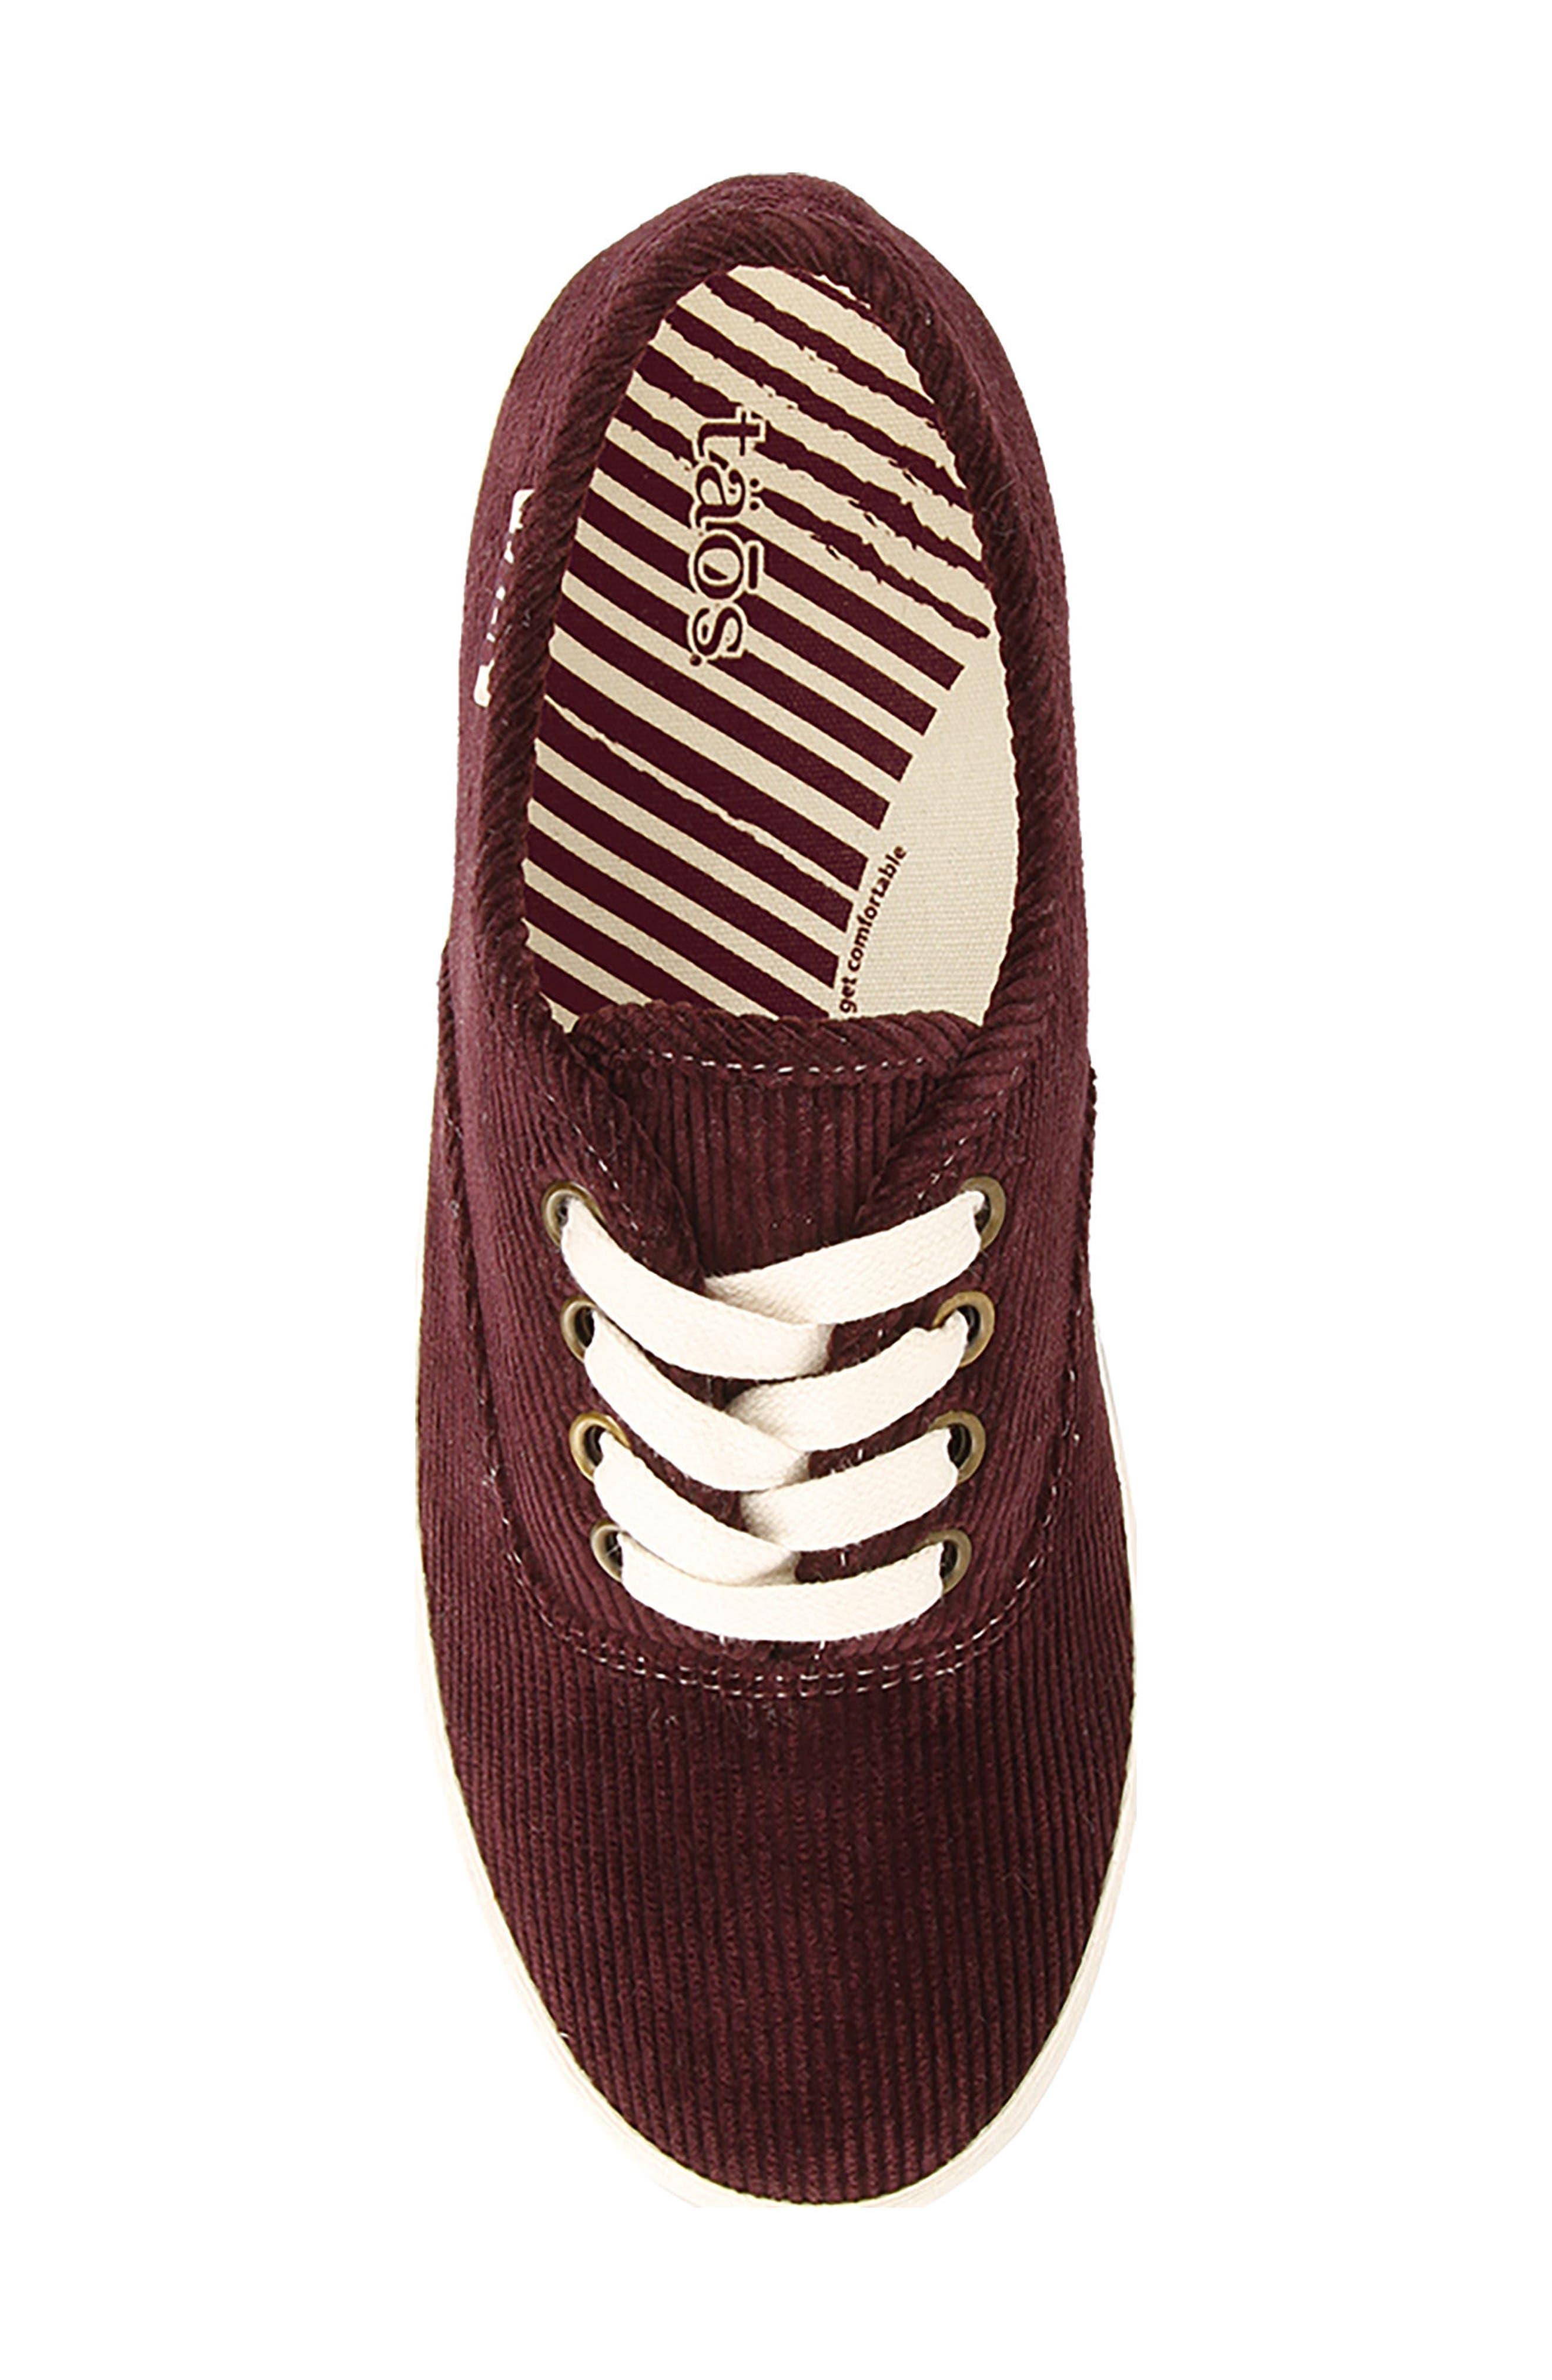 Guest Star Sneaker,                             Alternate thumbnail 5, color,                             Bordeaux Cord Fabric